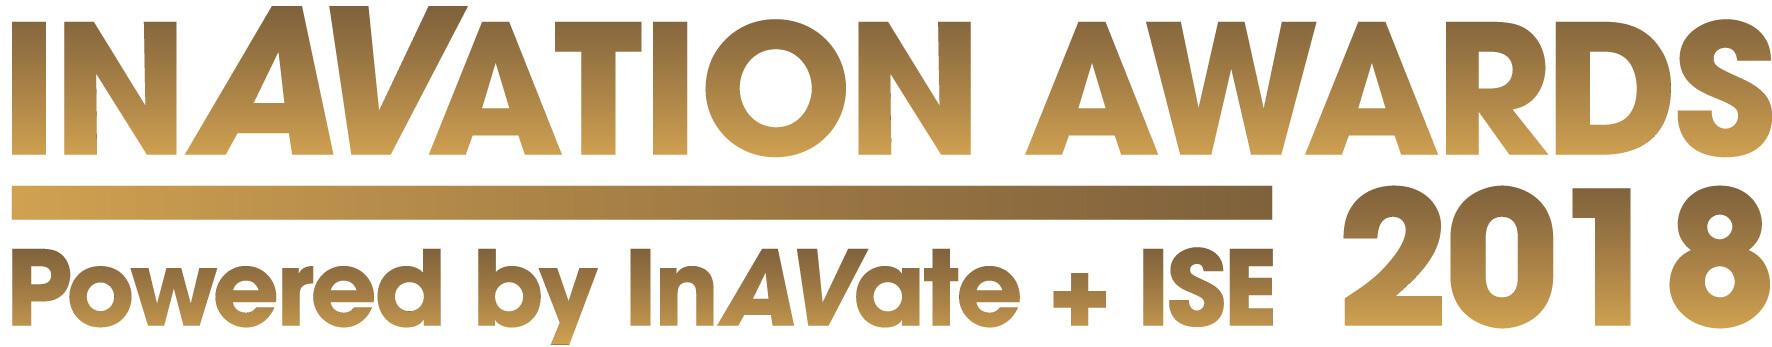 InAVation-Awards-Logo-gold-2018-ISE-DARK.jpg